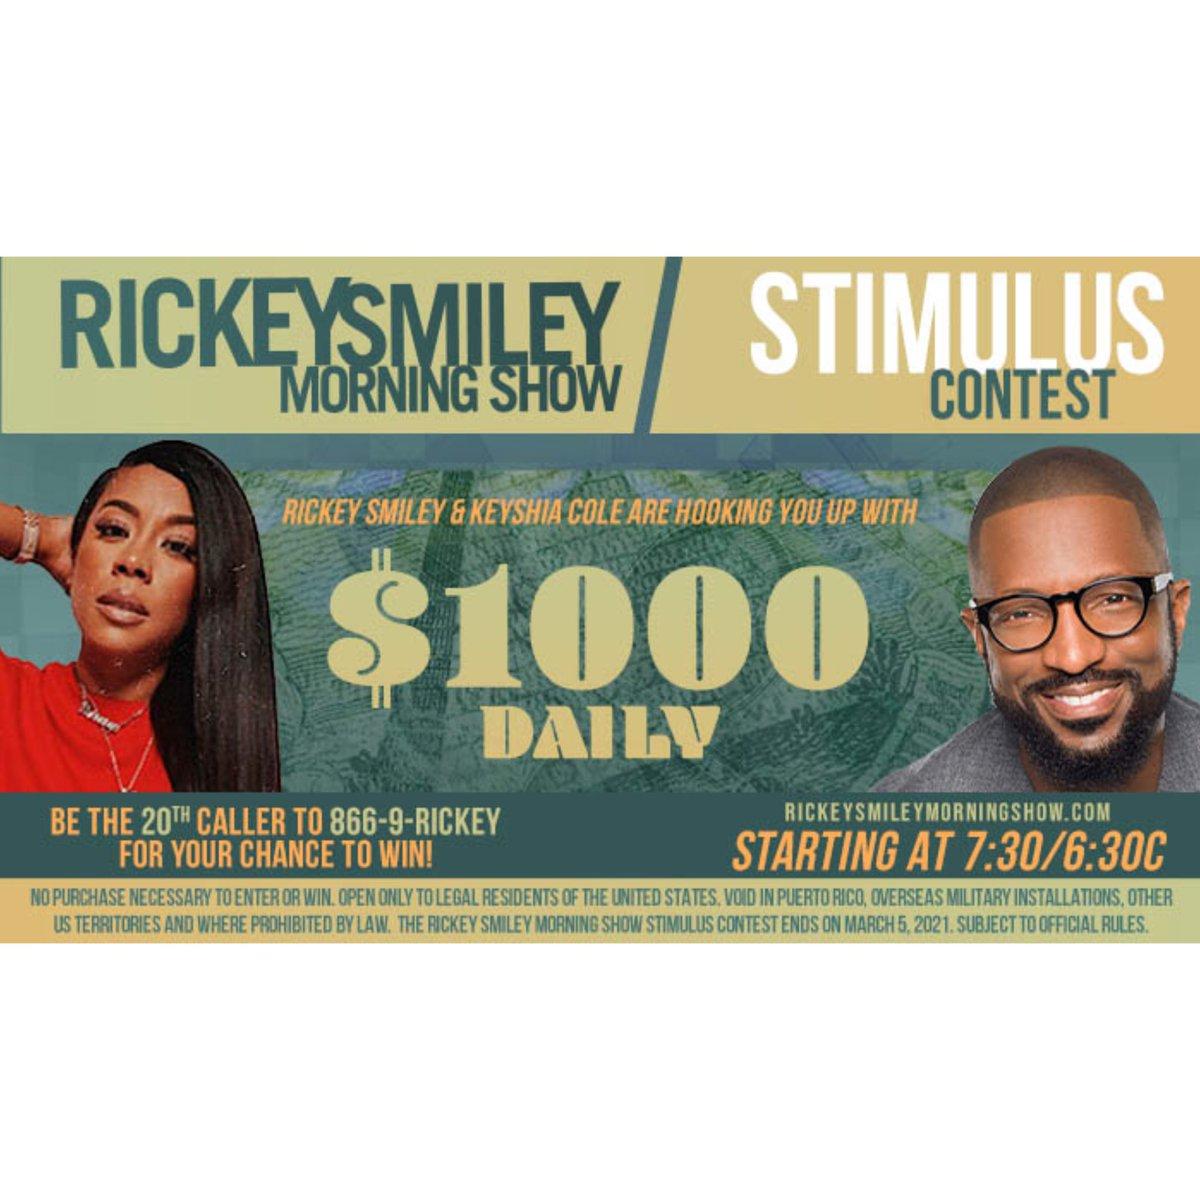 Tune into @rickeysmileymorningshow tomorrow morning @1067wtlc @rickeysmileyofficial & @keyshiacole is giving away $1000 #wtlcisindy #tlcisindy